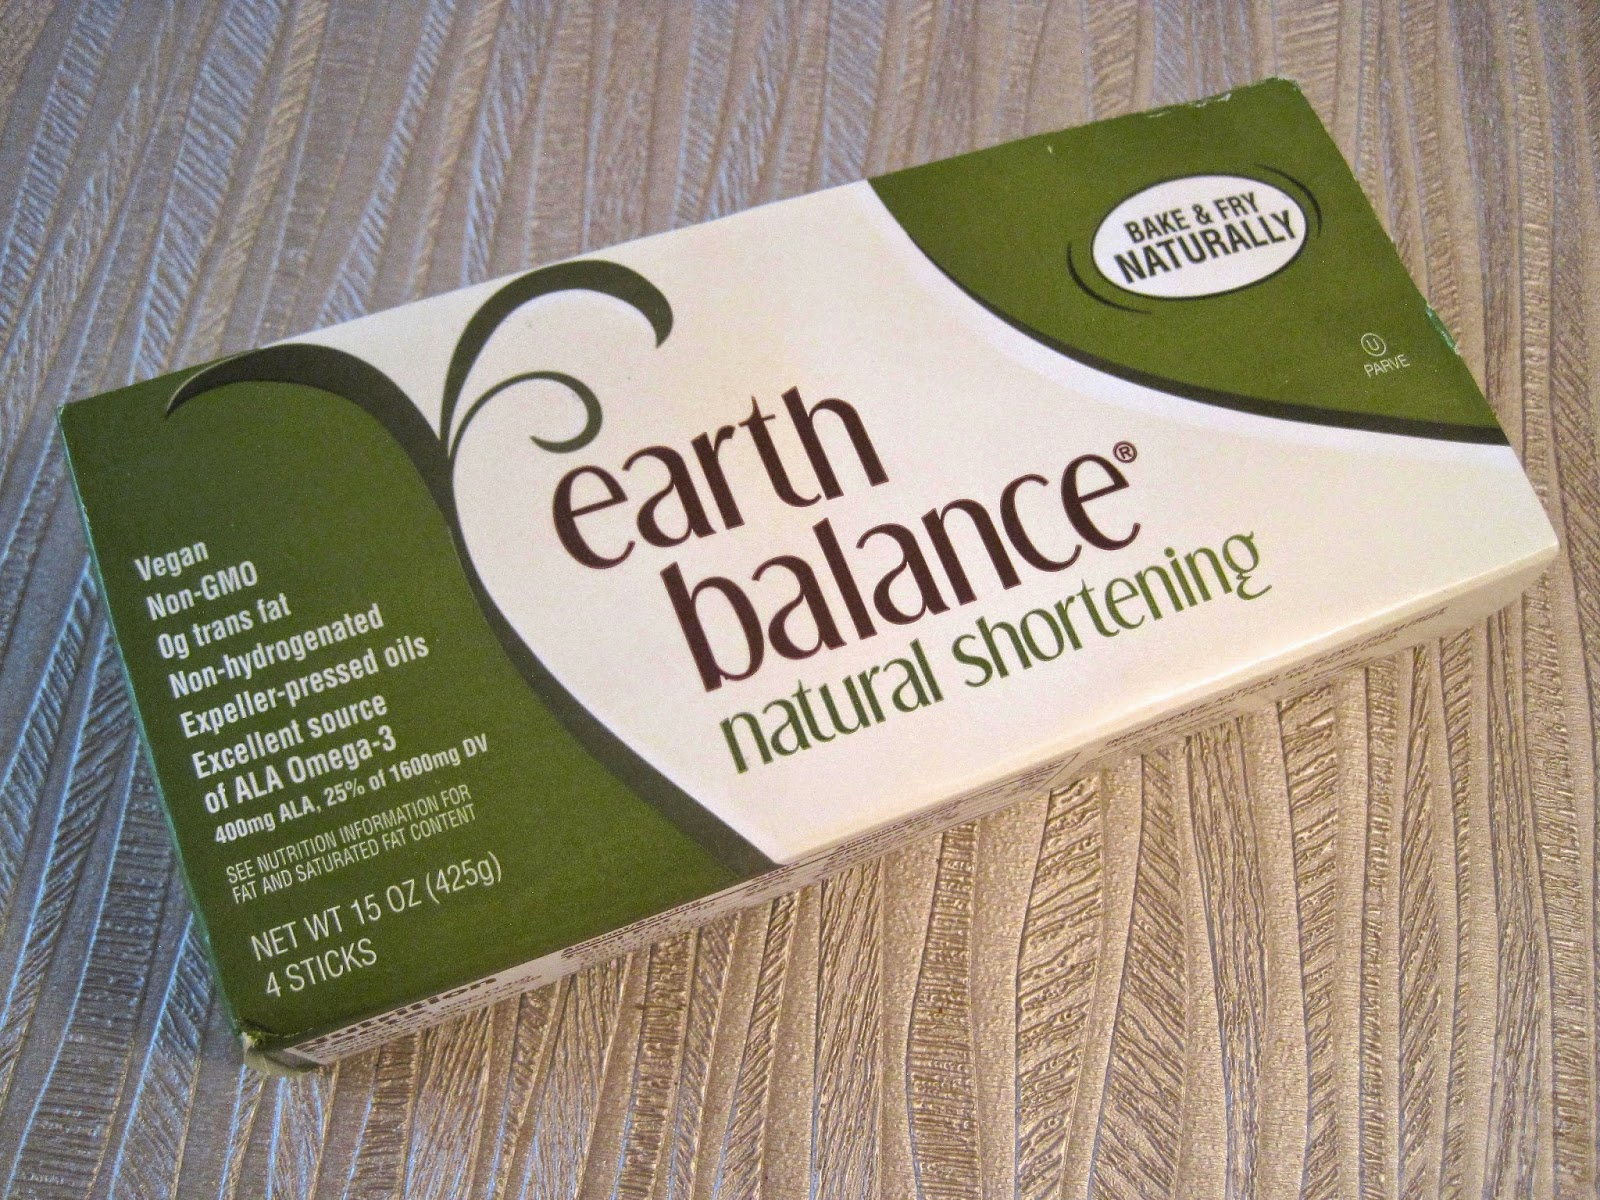 Earth Balance Natural Shortening Vegan - Veega